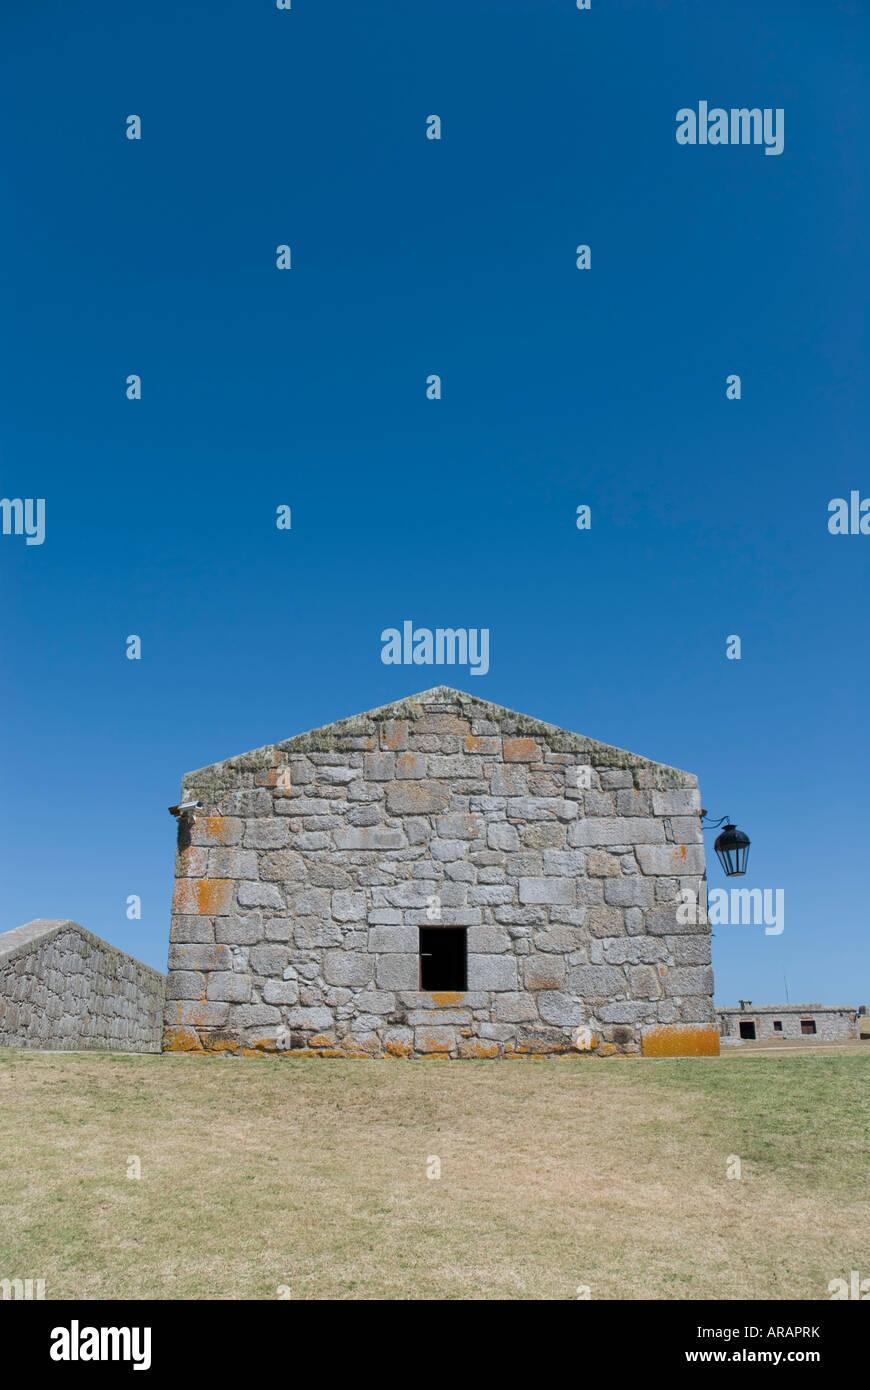 Captura recortada de la iglesia dentro de 'Fortaleza' de Santa Teresa, Rocha, Uruguay. Imagen De Stock